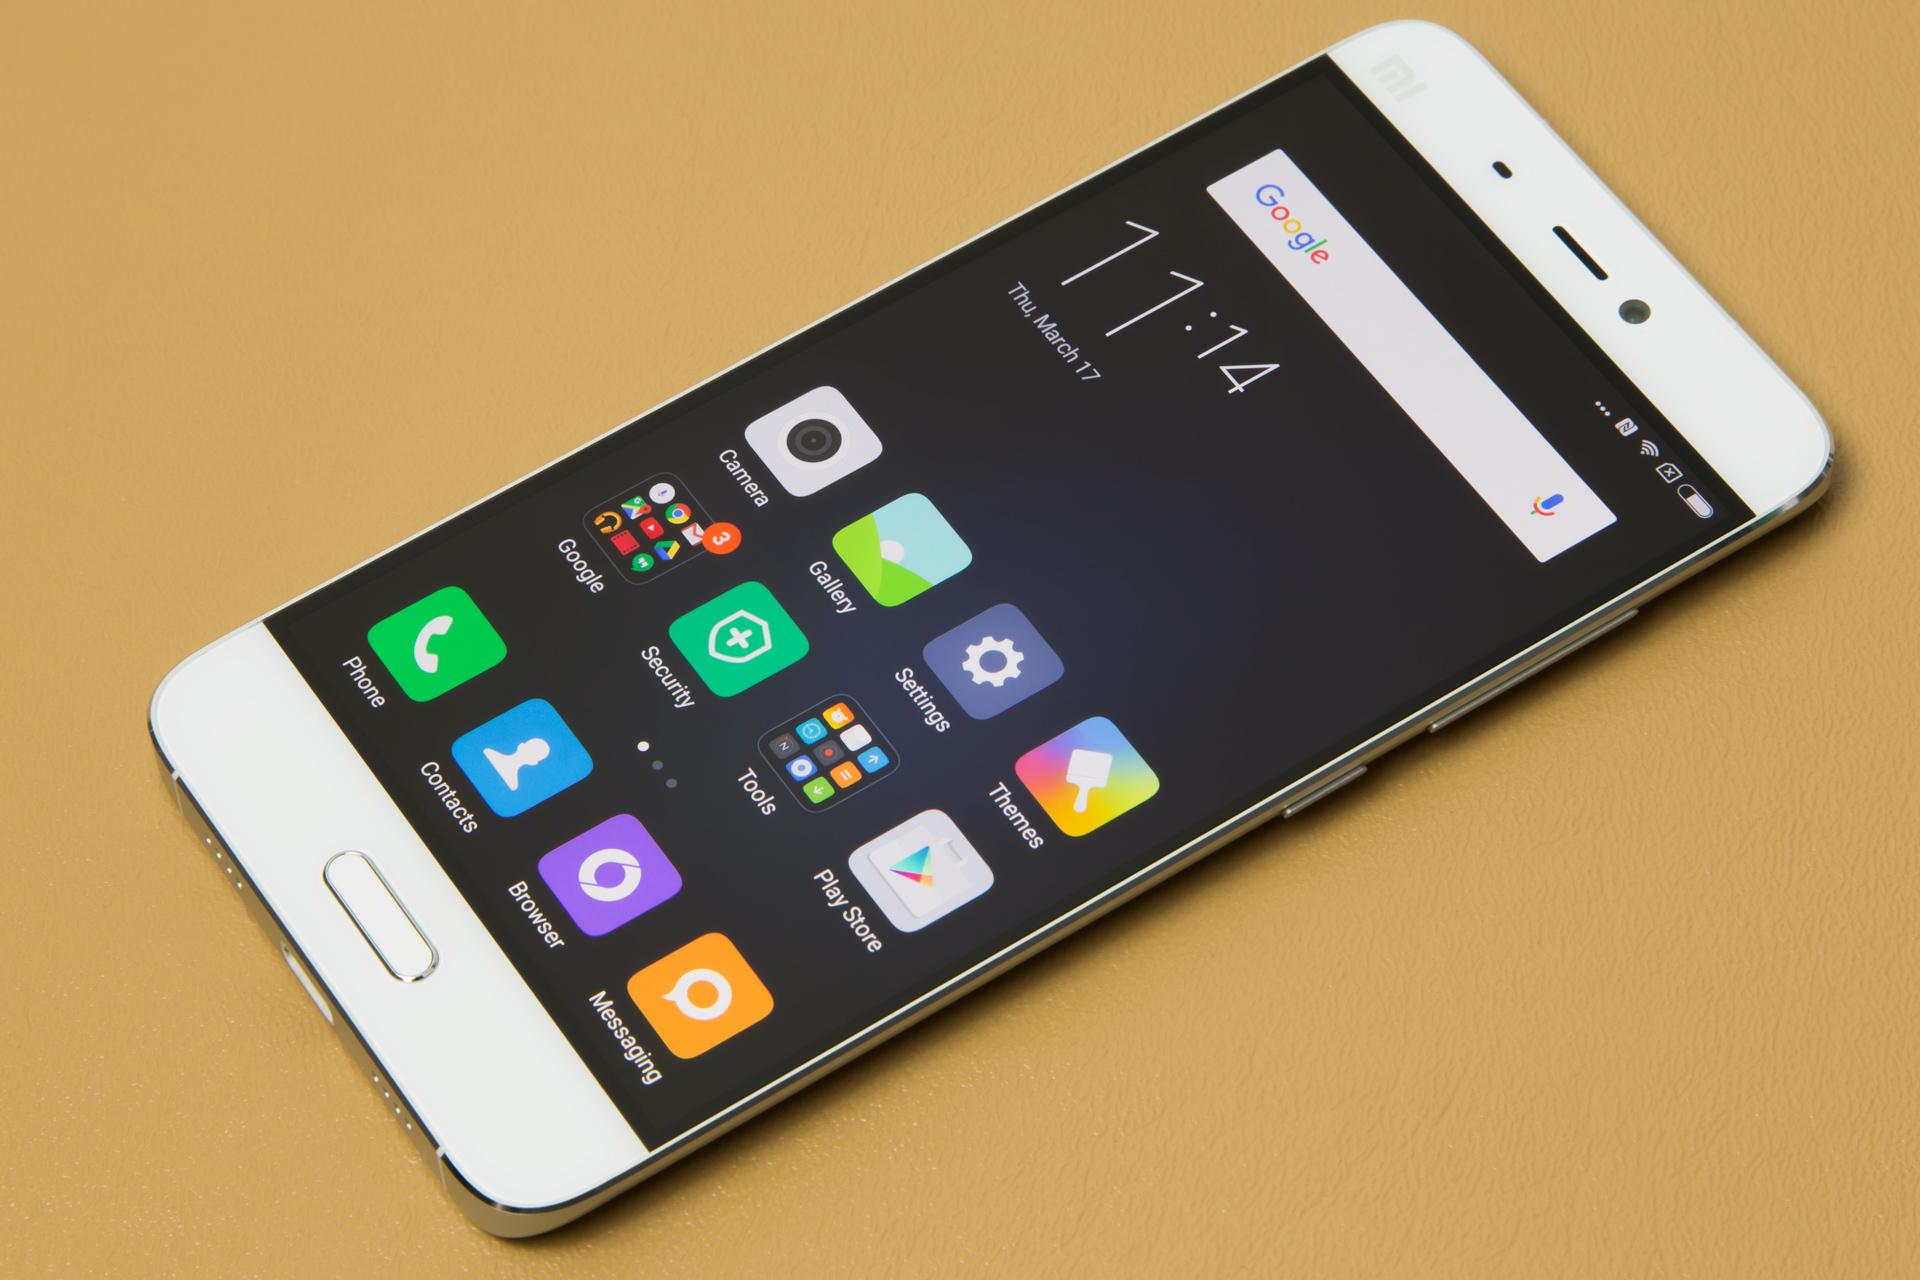 The Xiaomi Mi 5